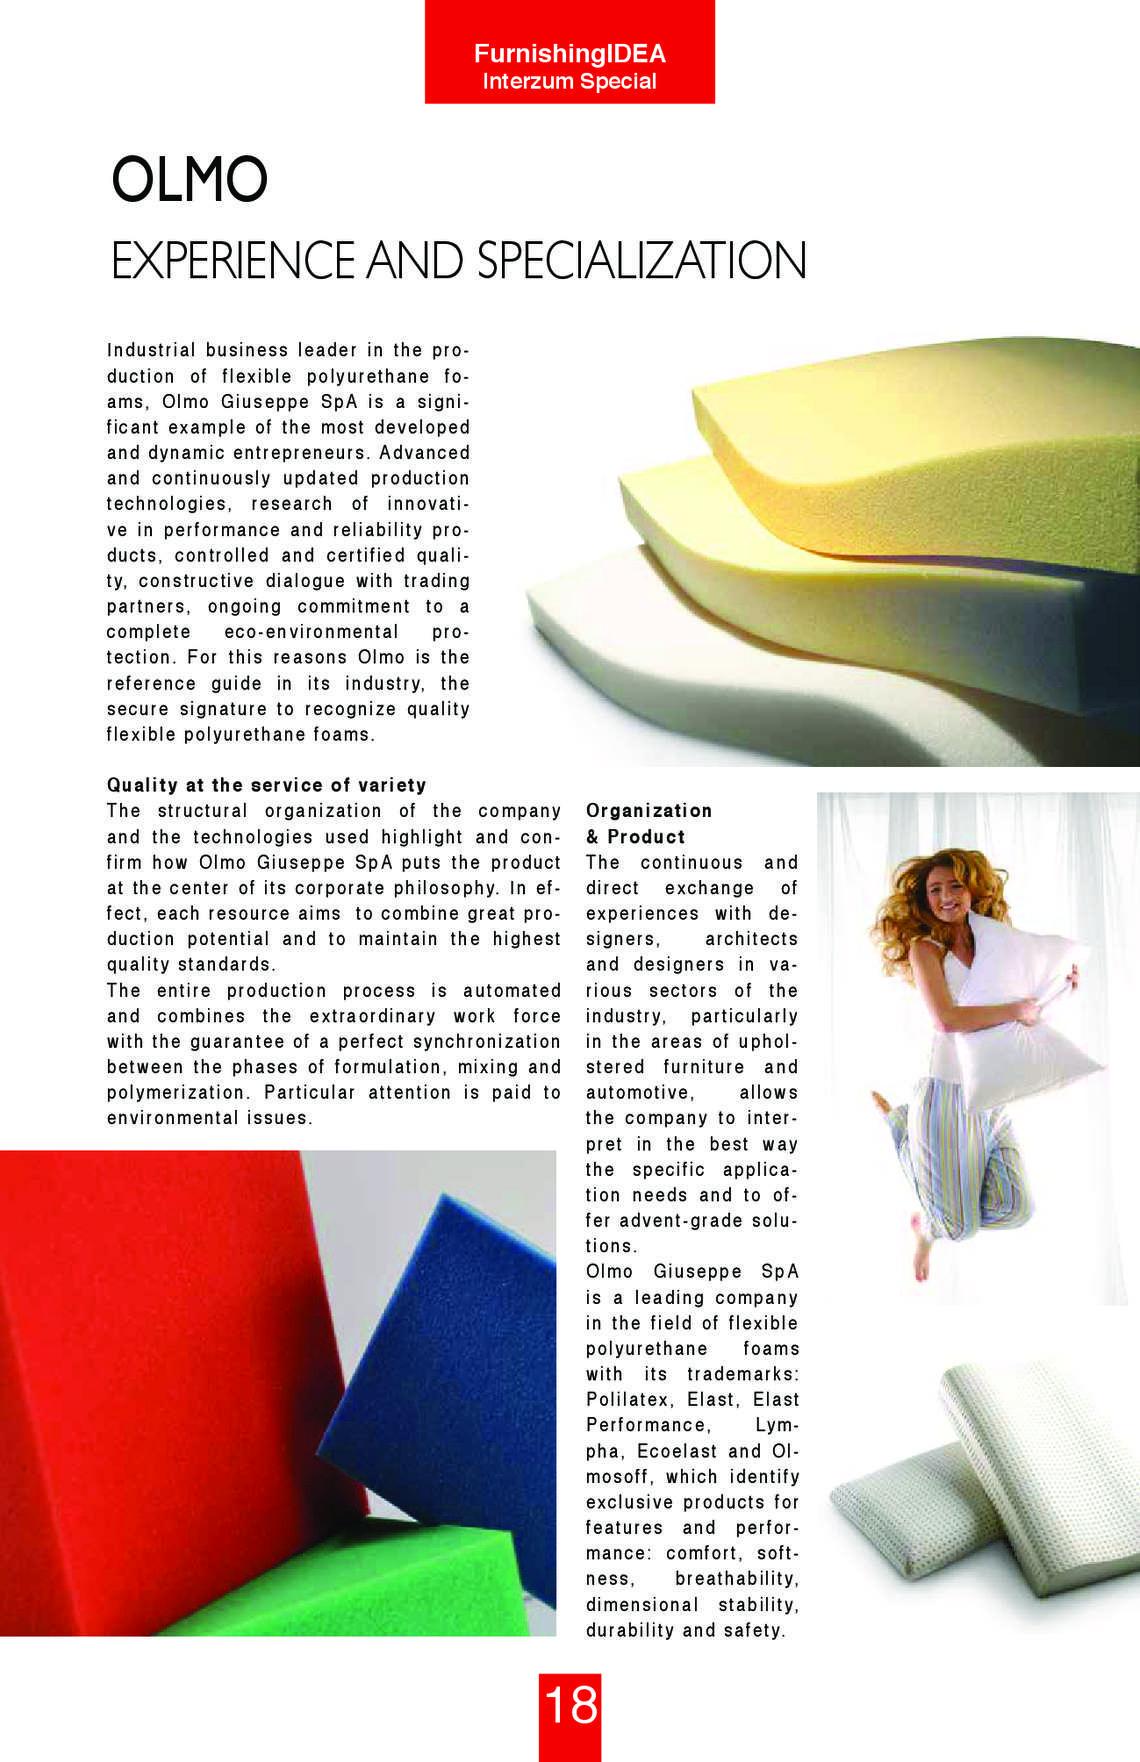 interzum-2015_journal_0_017.jpg